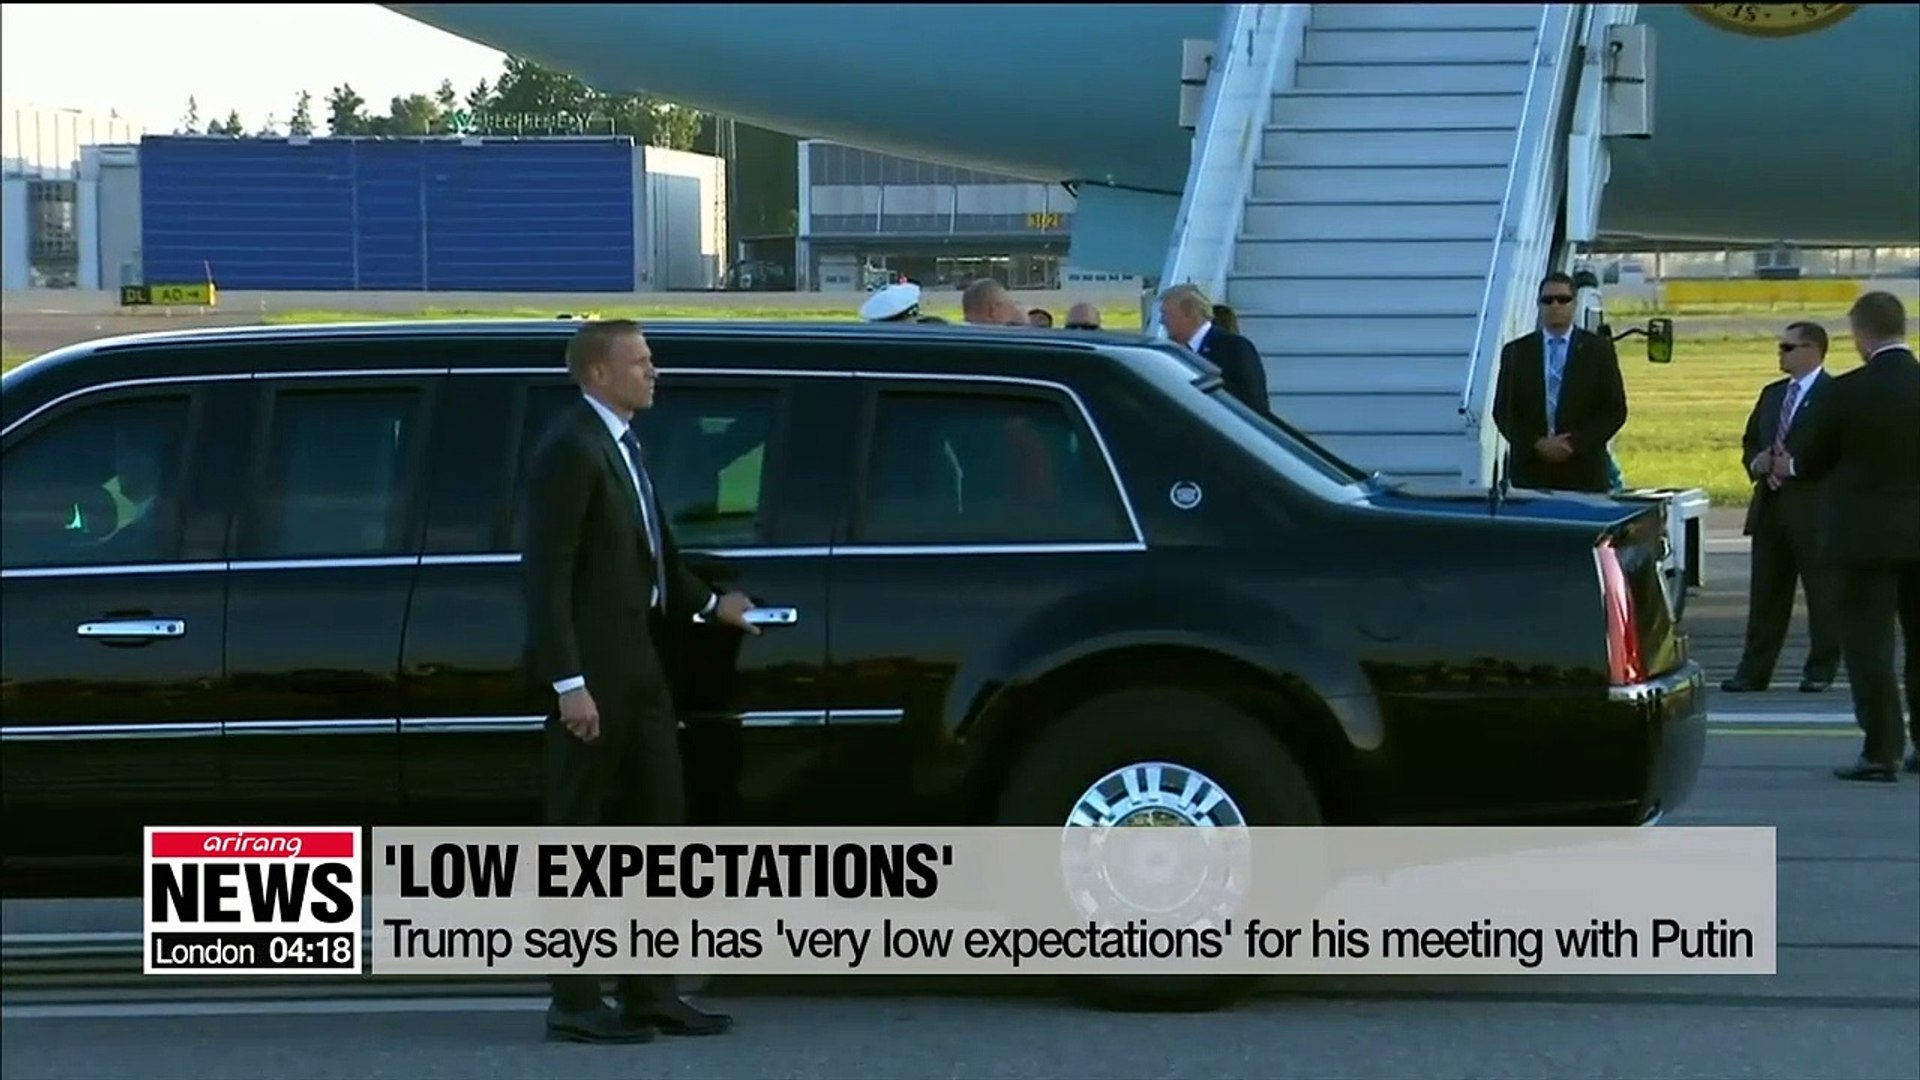 Trump strikes pessimistic tone before summit with Putin in Helsinki